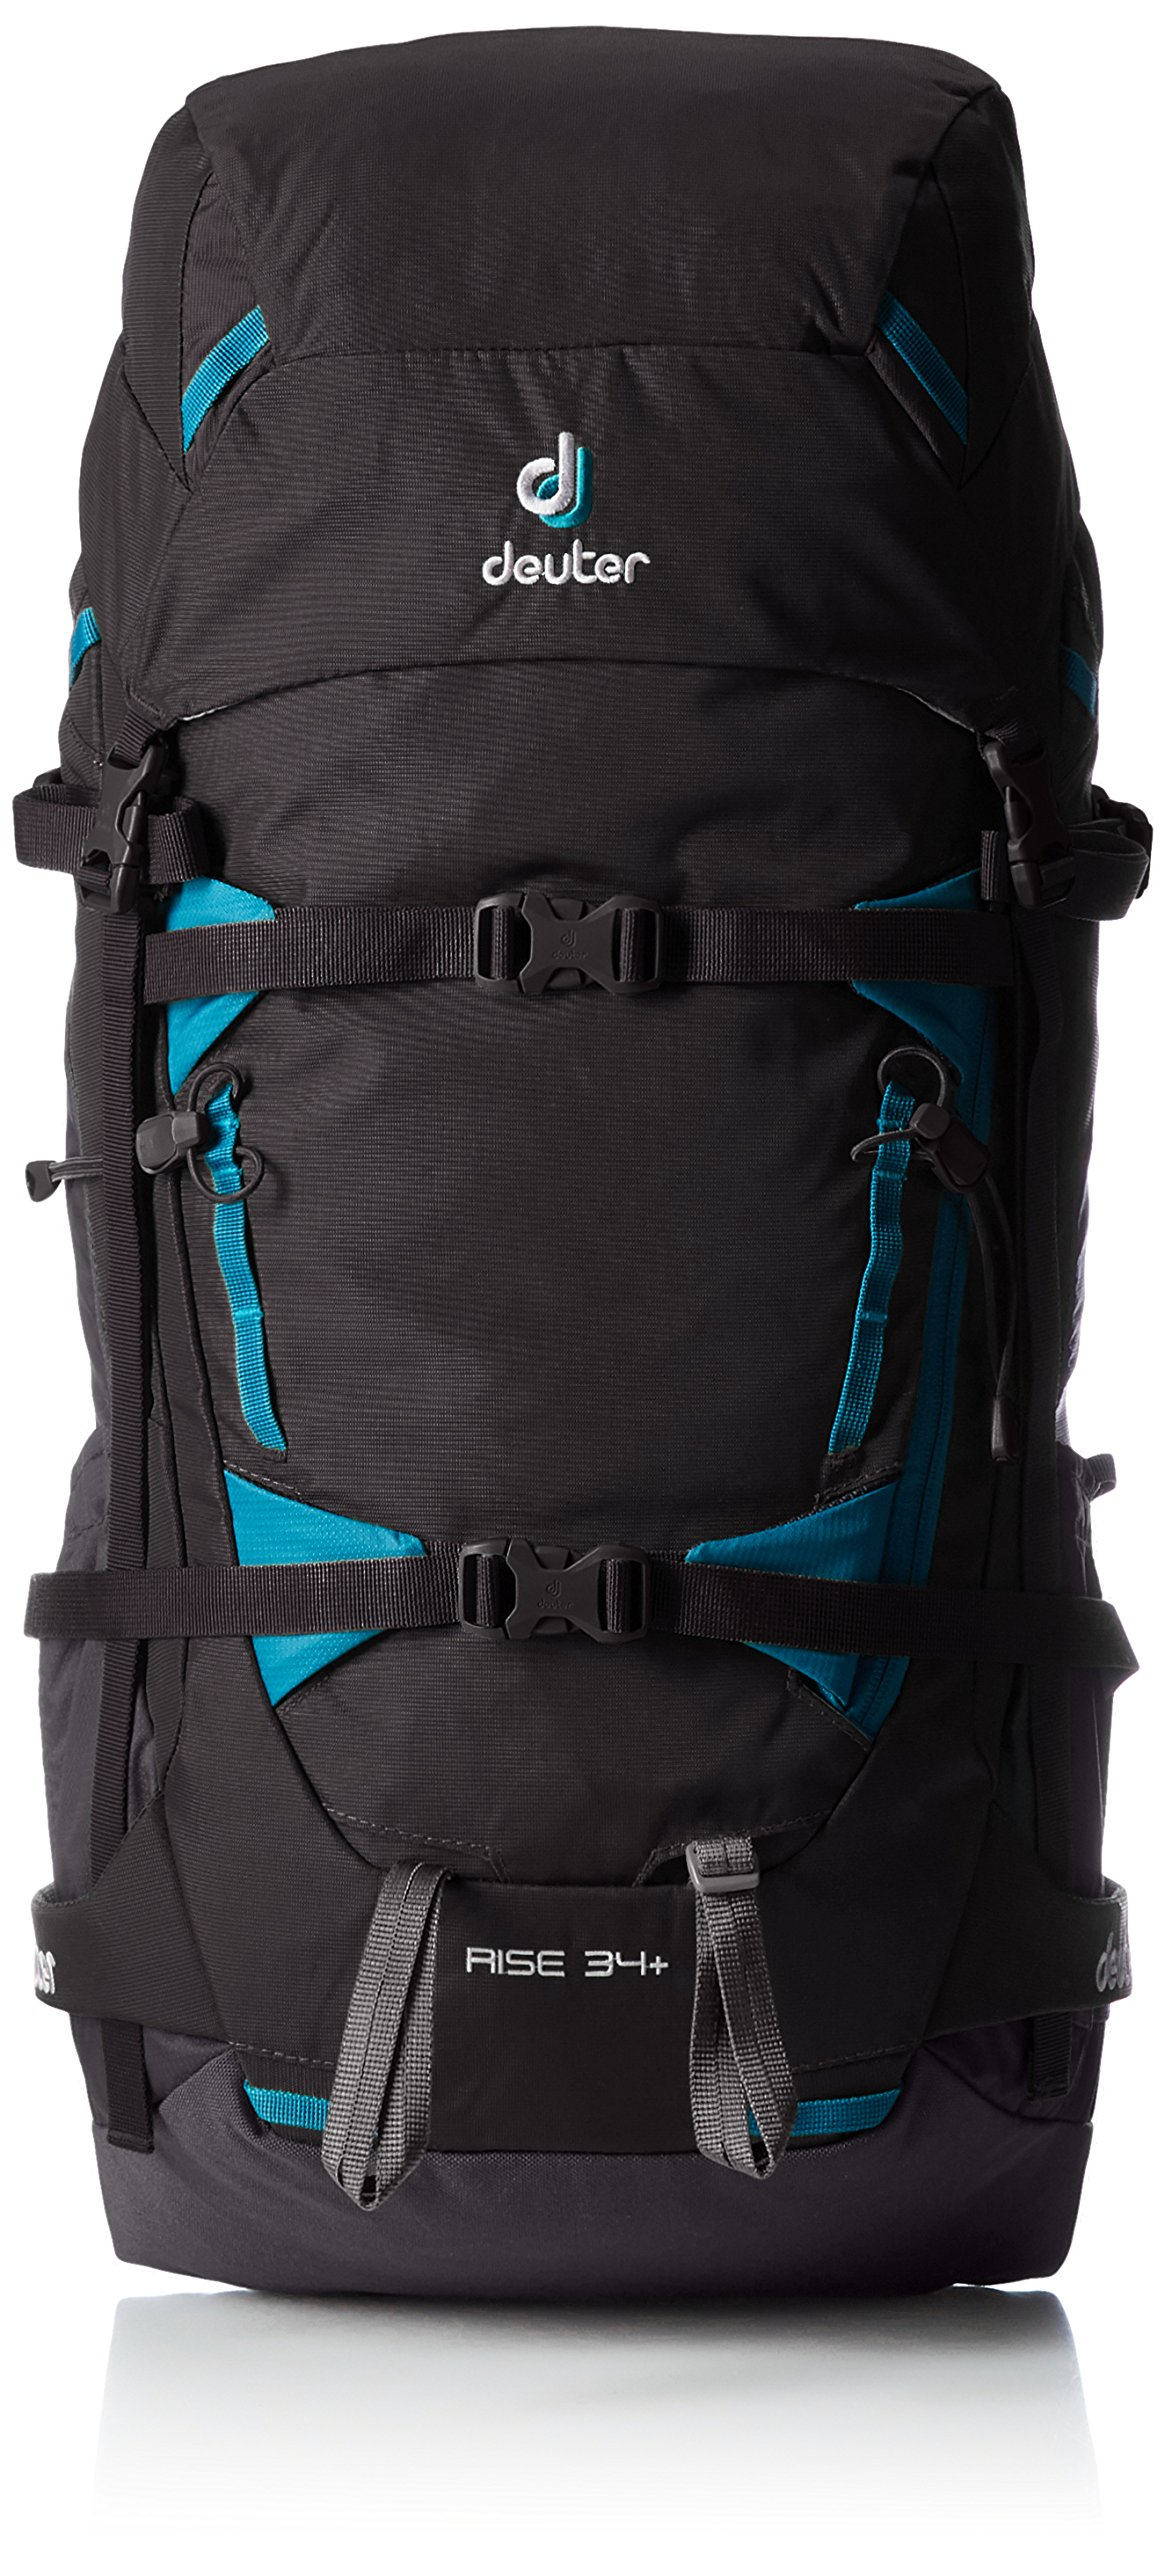 Deuter Rise 34+ Hiking Pack (Black/Graphite)